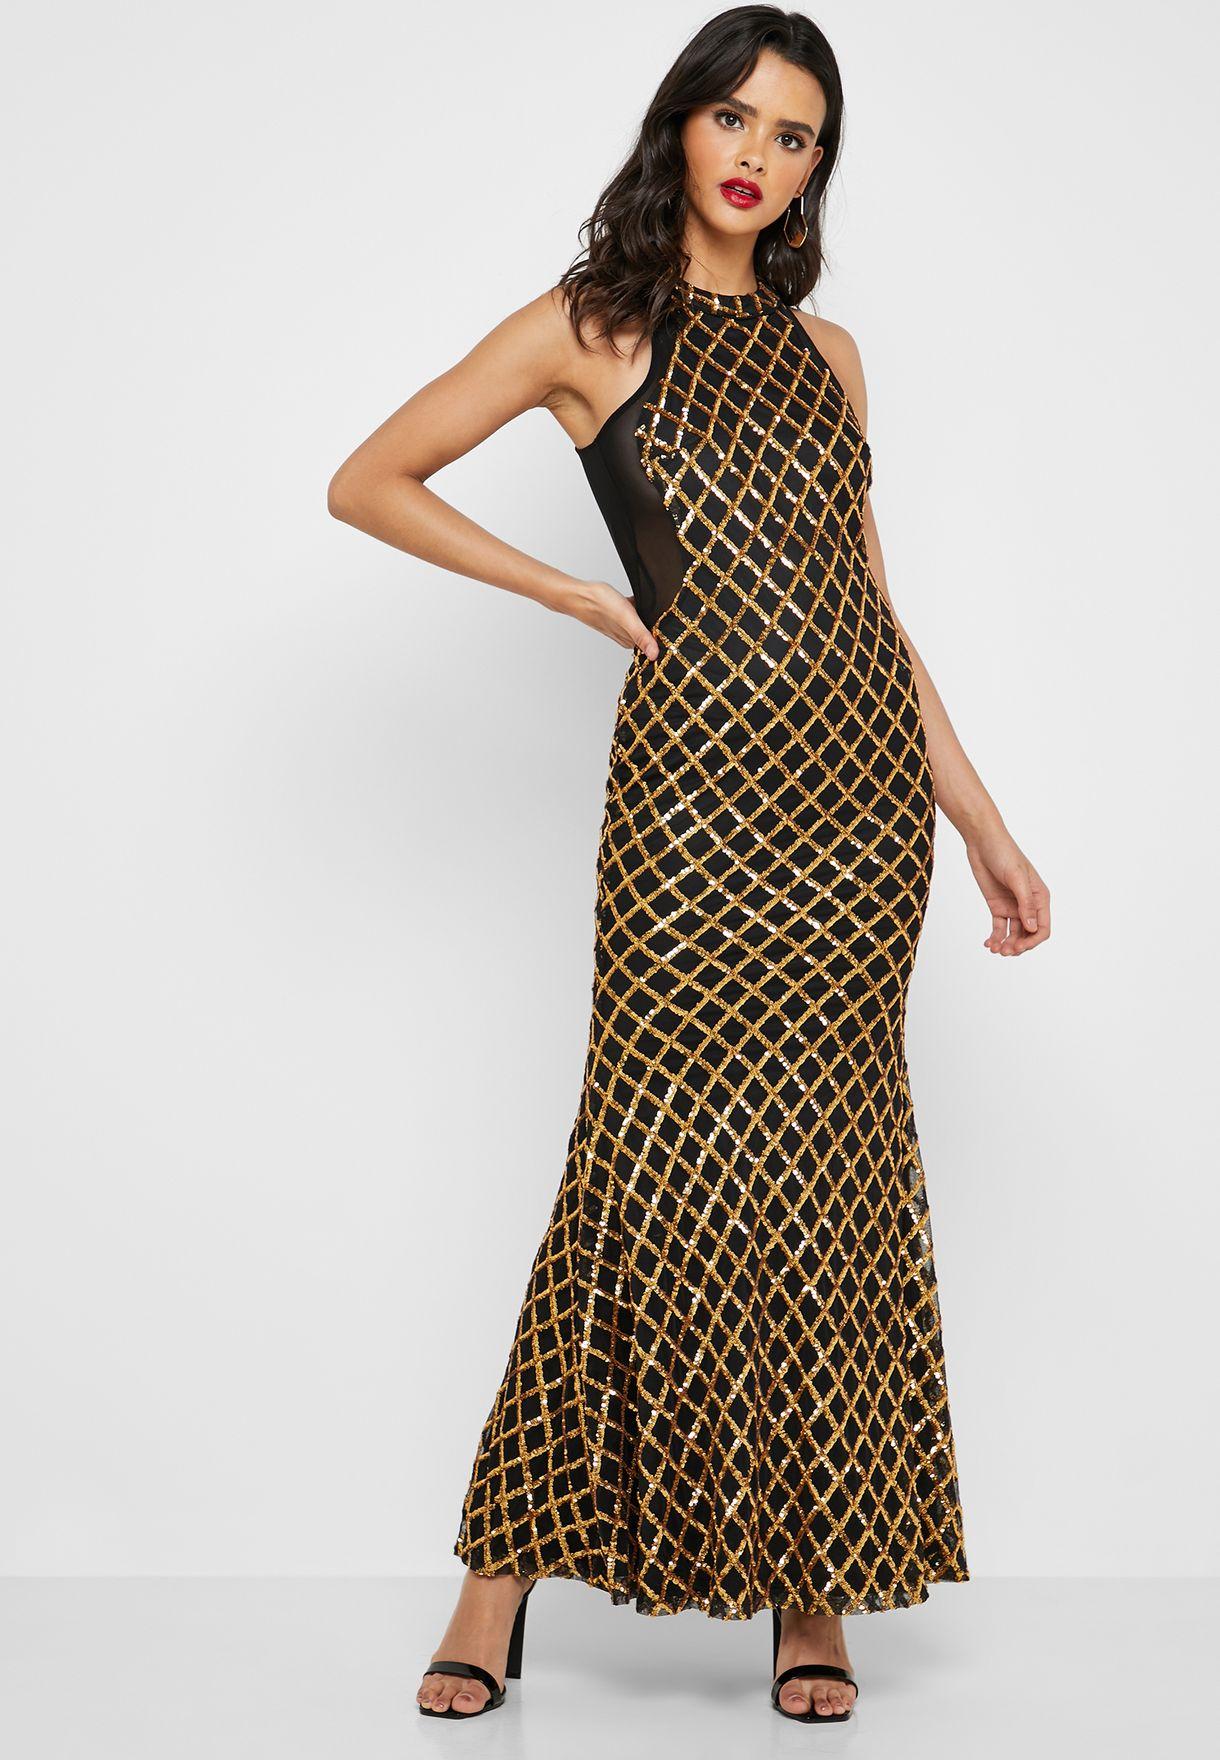 فستان مكسي مزين بترتر